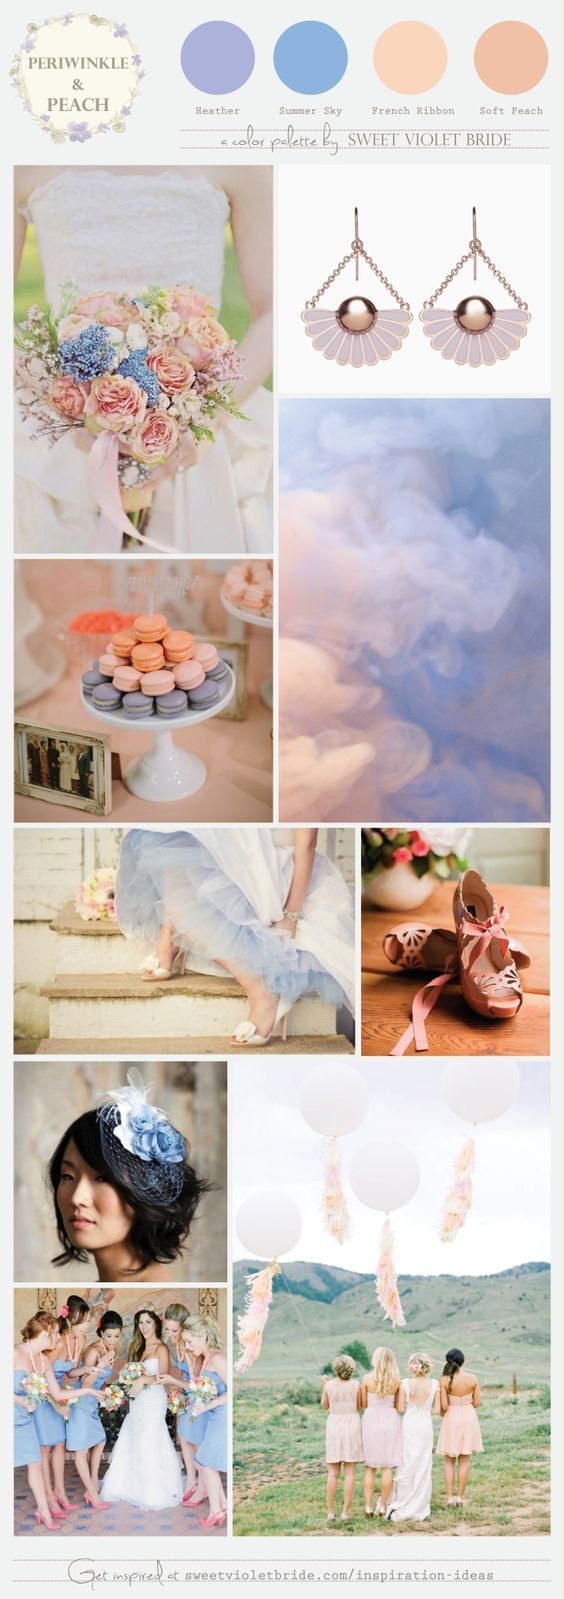 Periwinkle Wedding Colors | Wedding Color Palette: Peach & Periwinkle